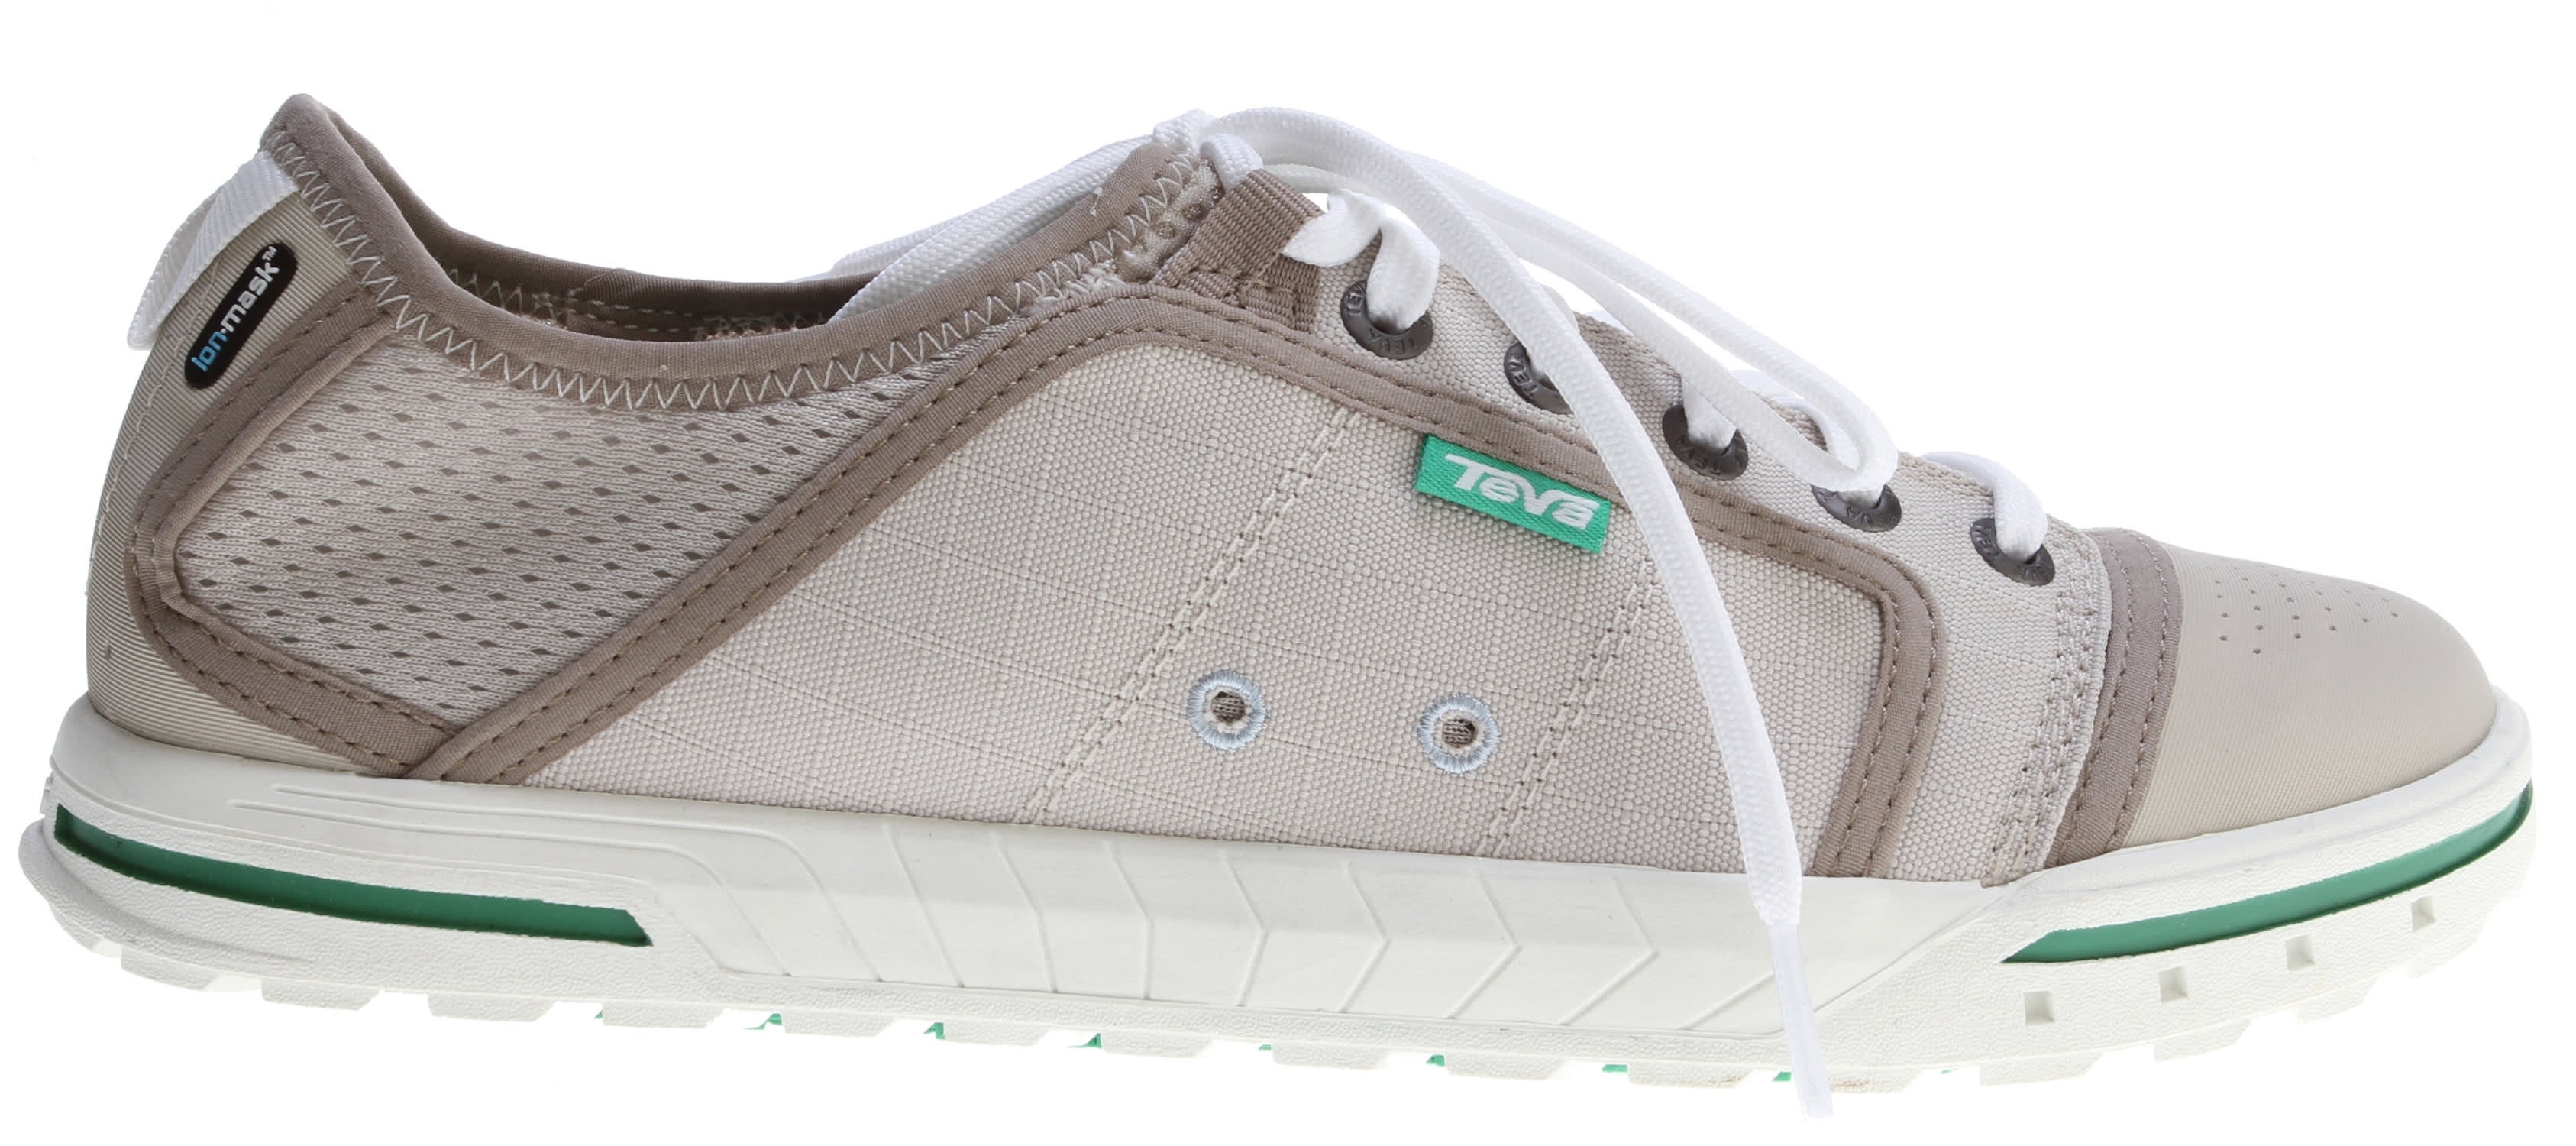 fbdd8c2c394 Teva Fuse-Ion Water Shoes - thumbnail 1